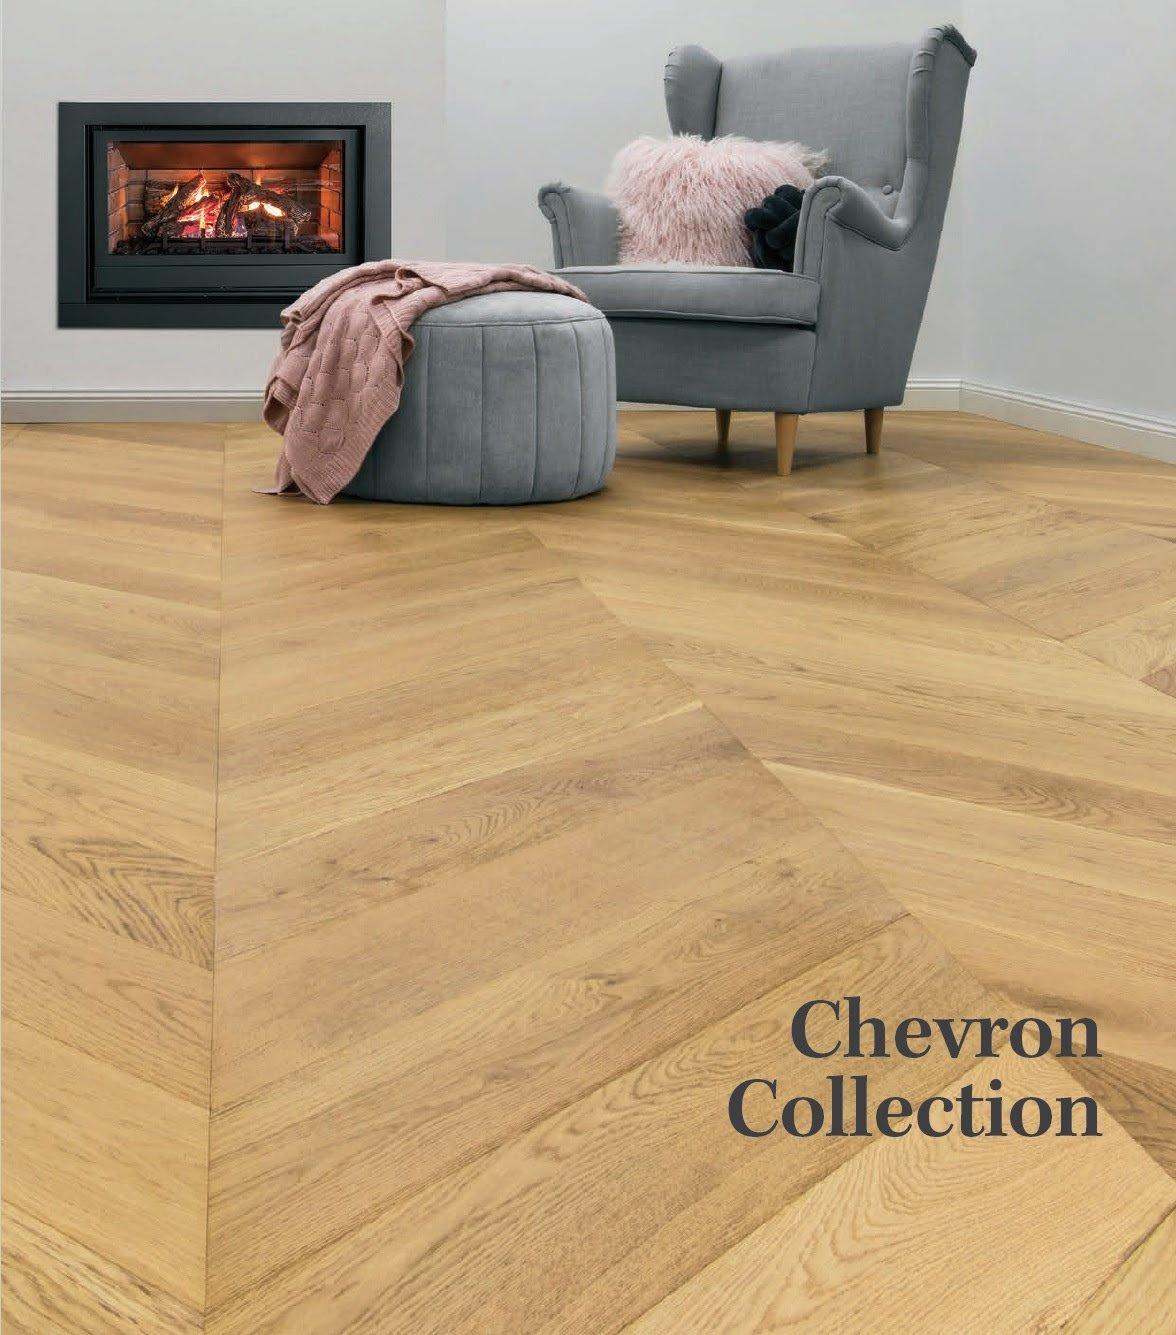 Chevron Flooring Australia